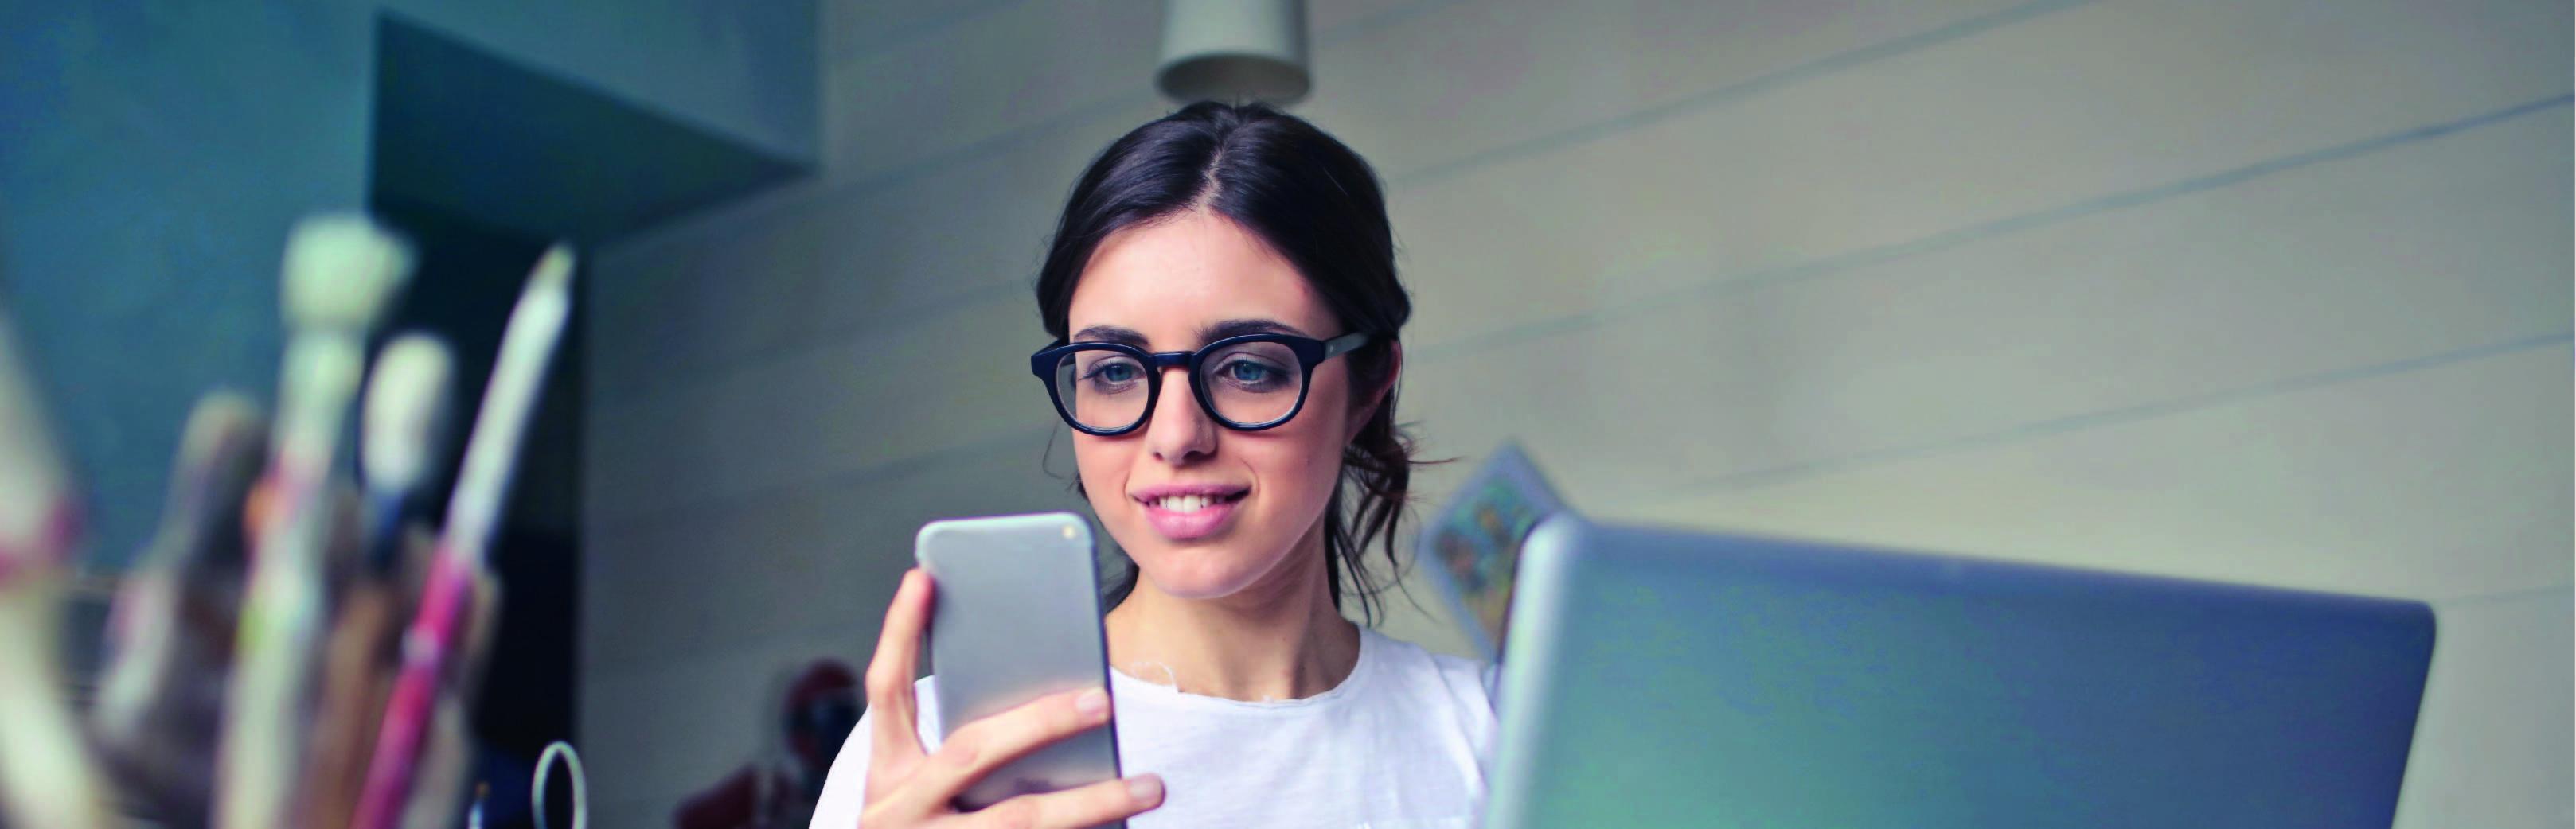 mercado de chatbots tem crescimento expressivo durante a pandemia